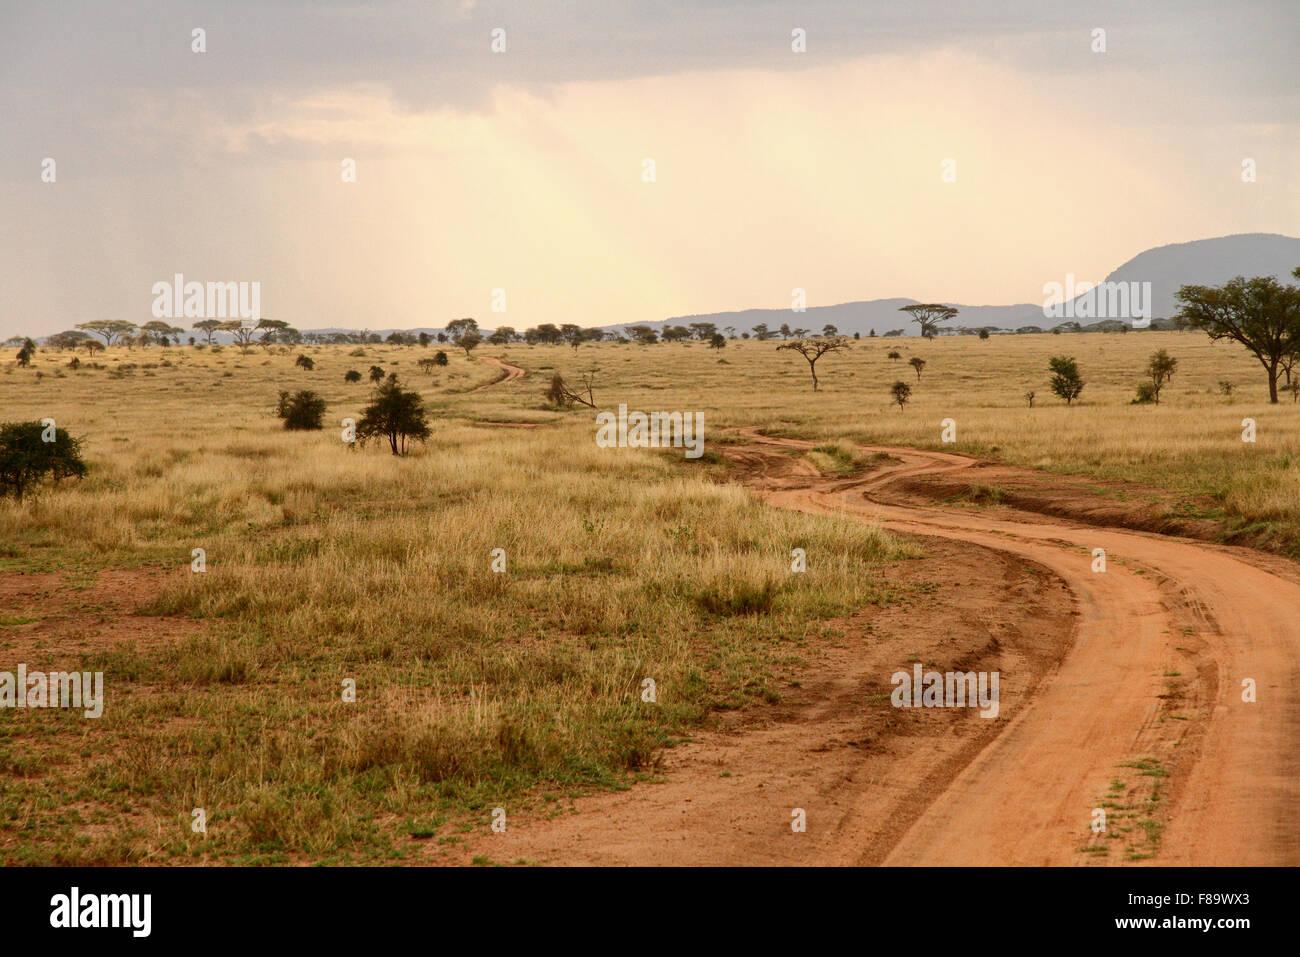 Un chemin serpente à travers la savane africaine Photo Stock